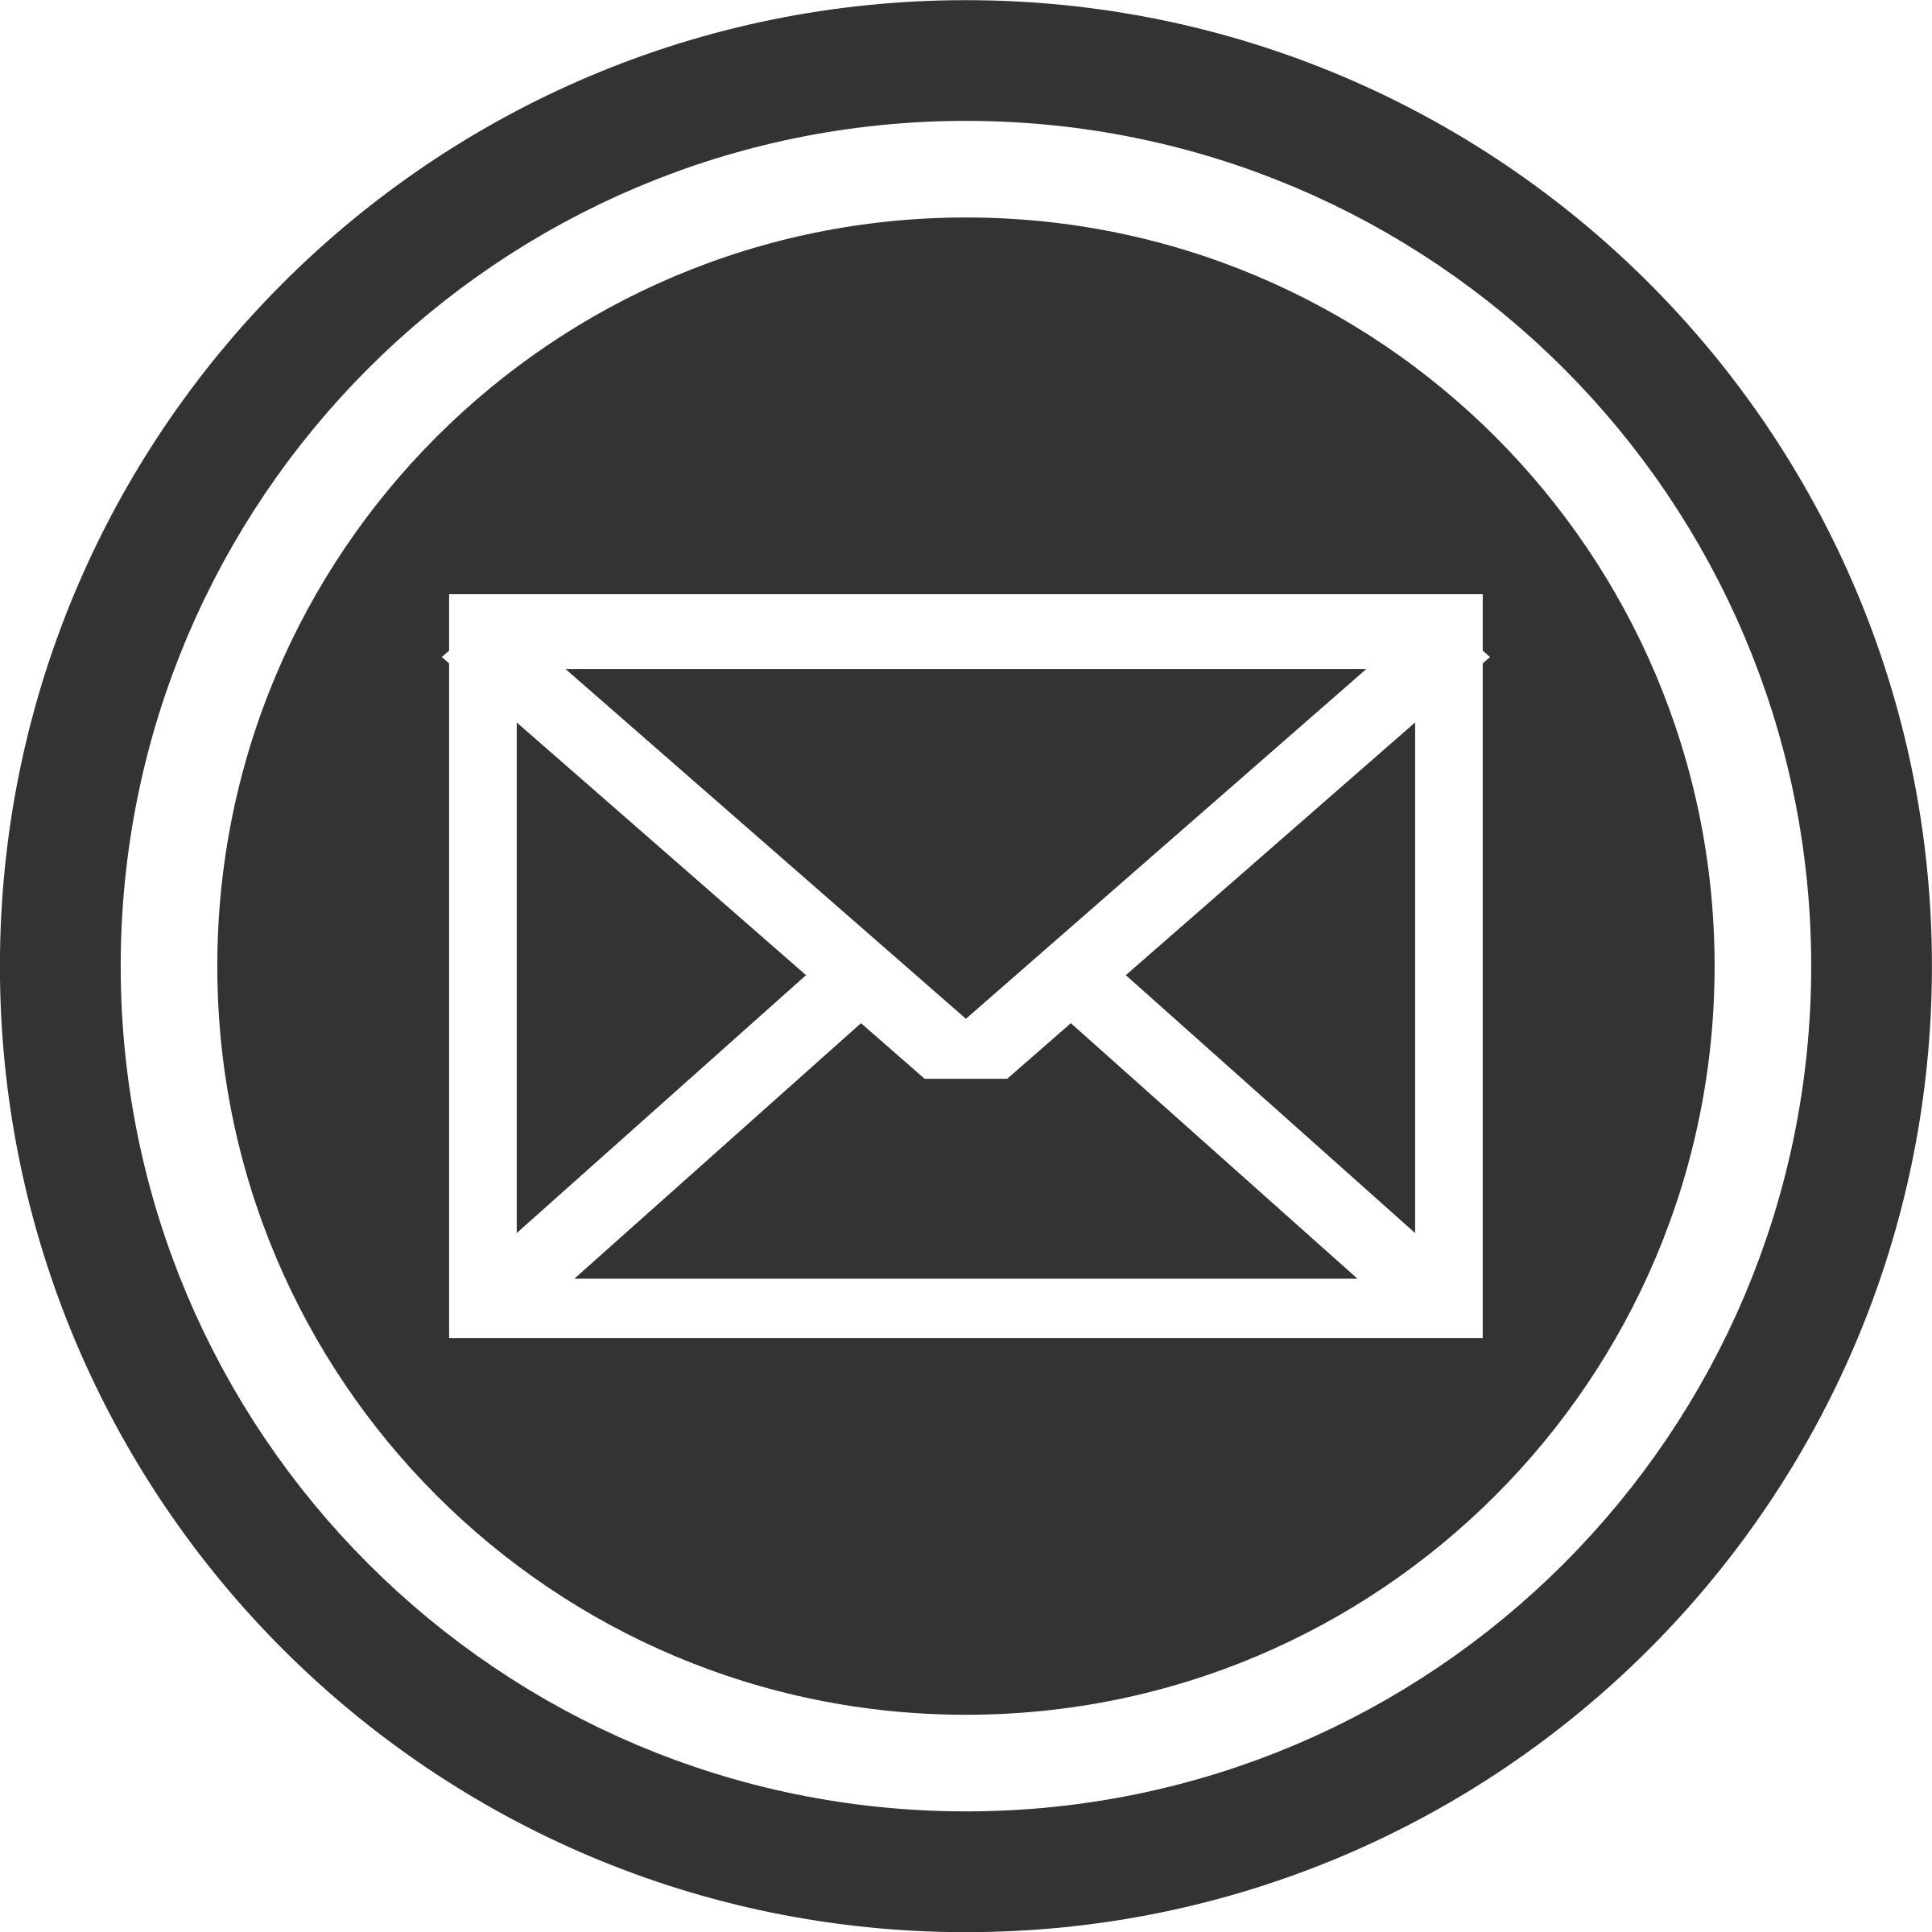 Mail clipart images clipartfest